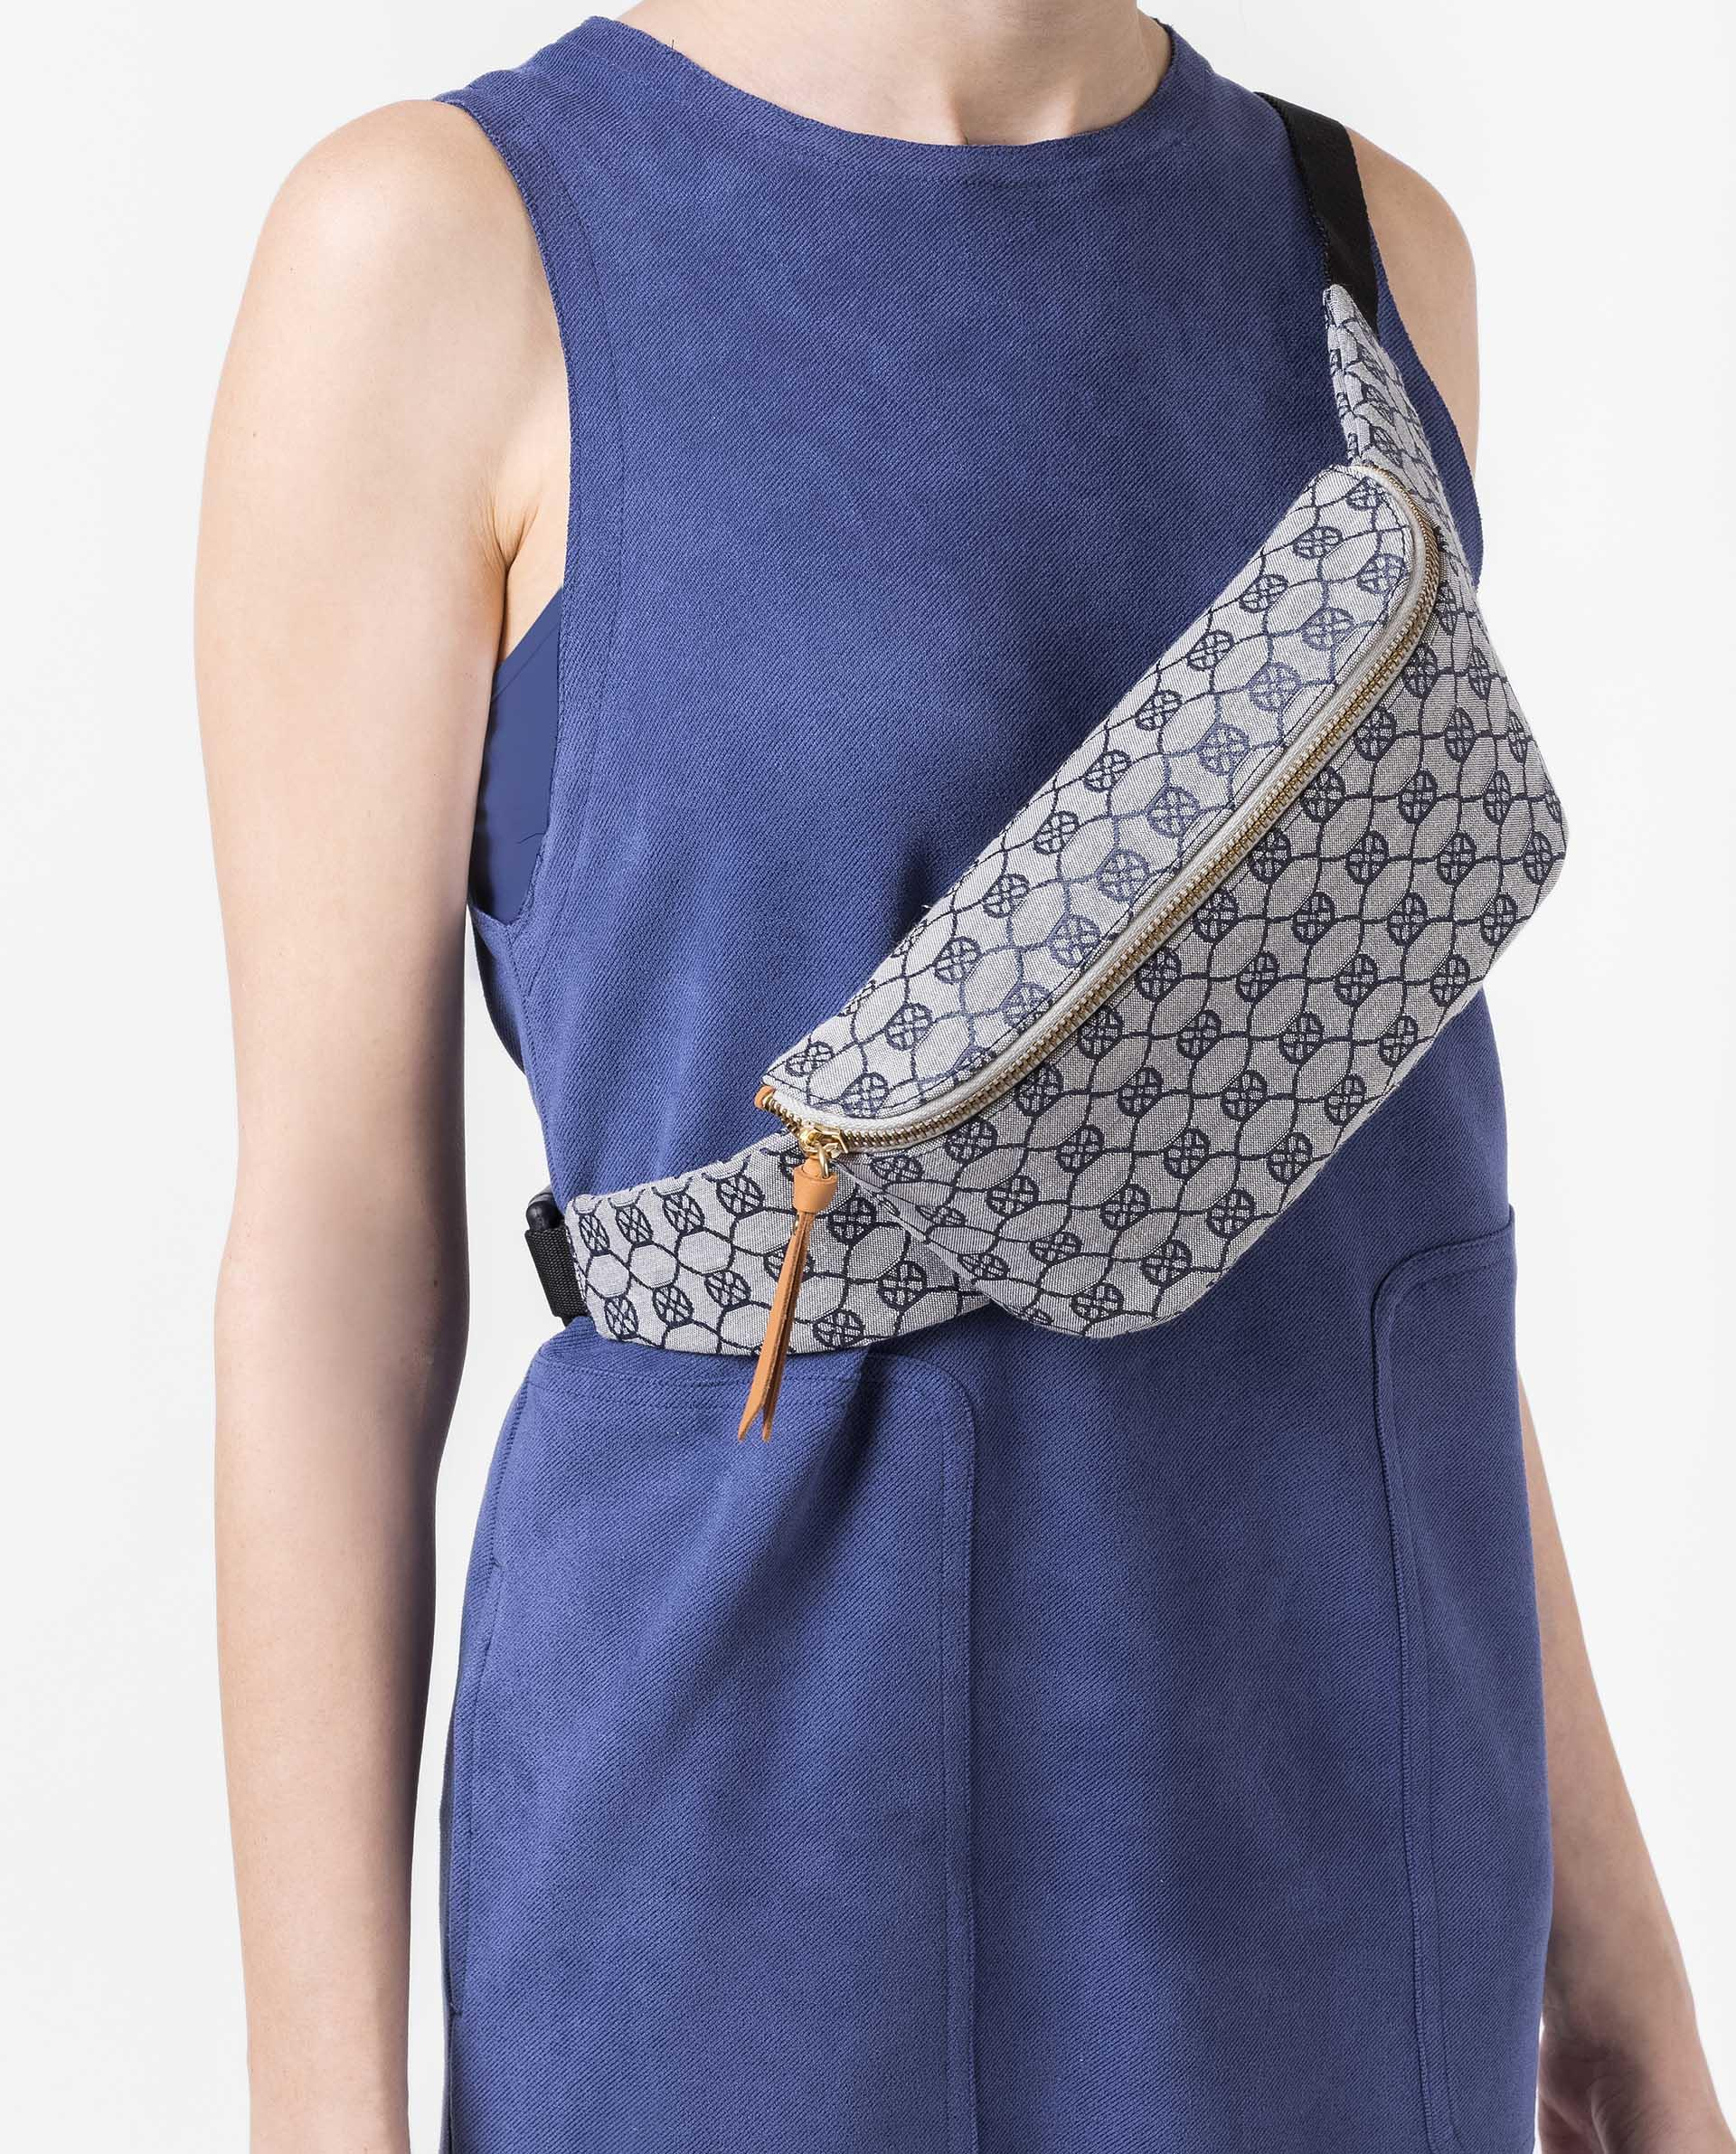 UNISA Fabric belt bag with monogram ZDUOMO_21_JAC 4